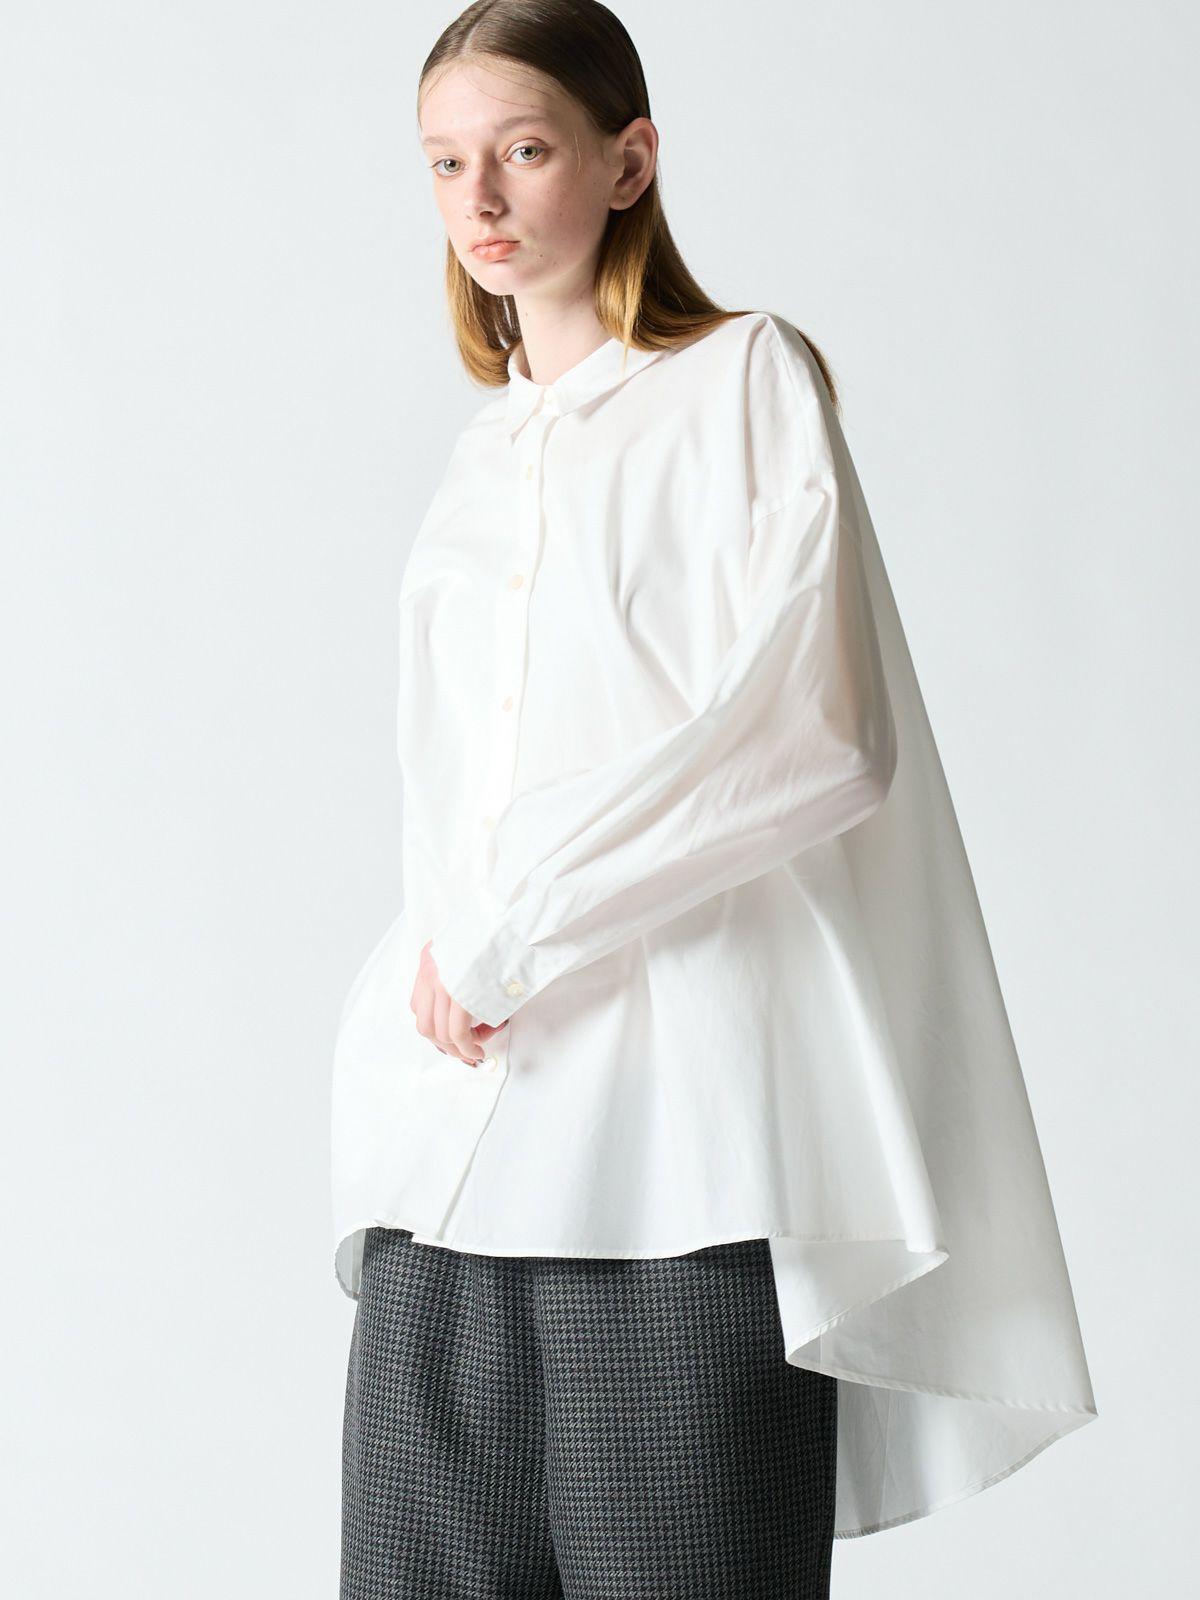 【2020AW新作】mizuiro ind ワイドシャツ